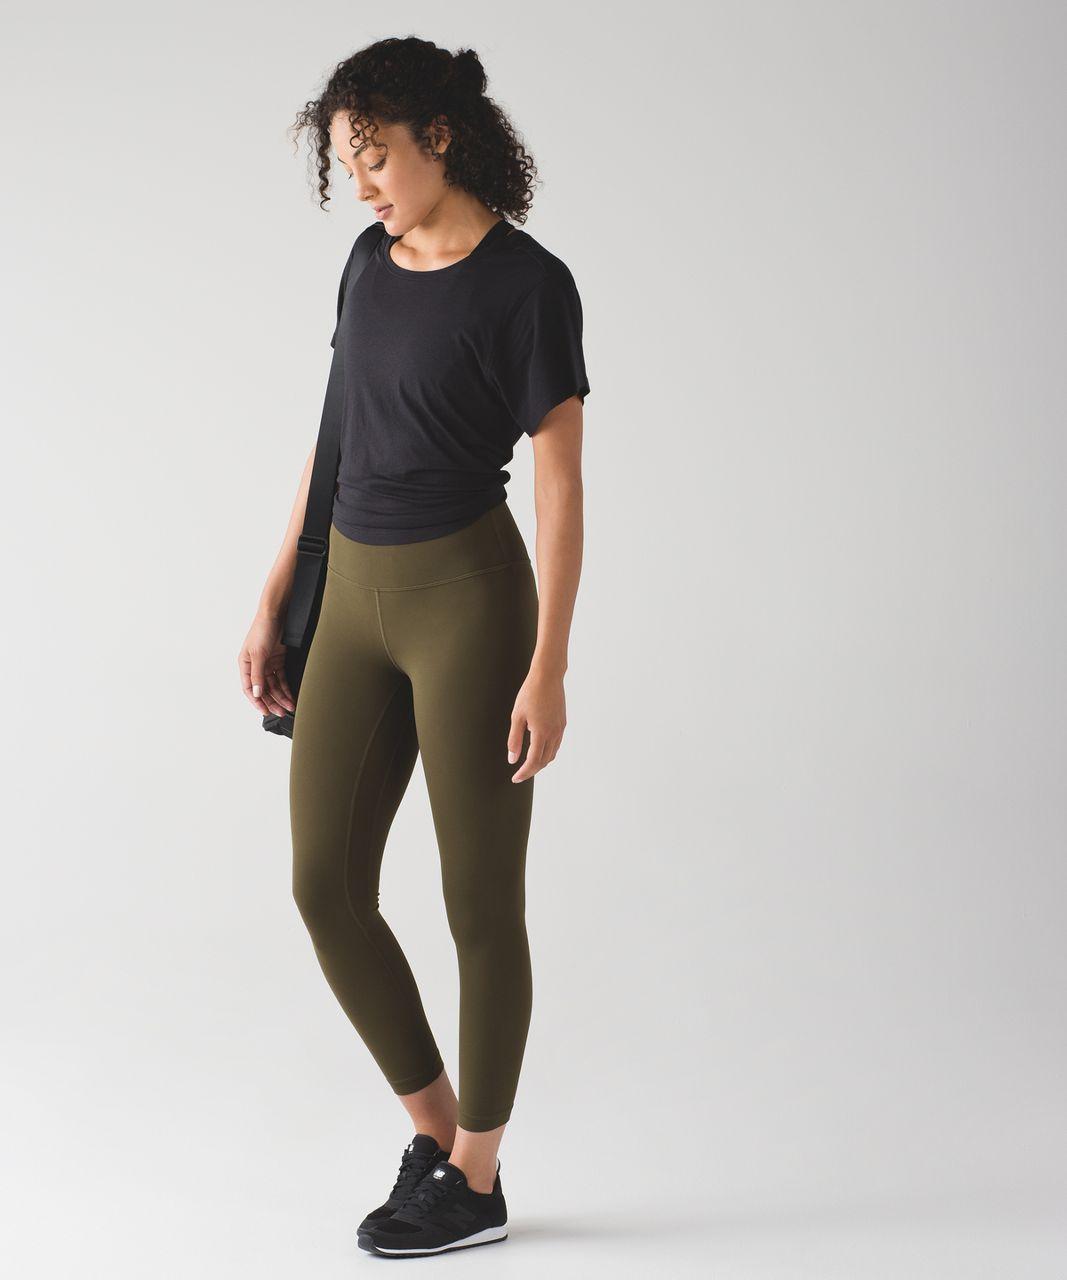 Lululemon Align Pant II - Military Green